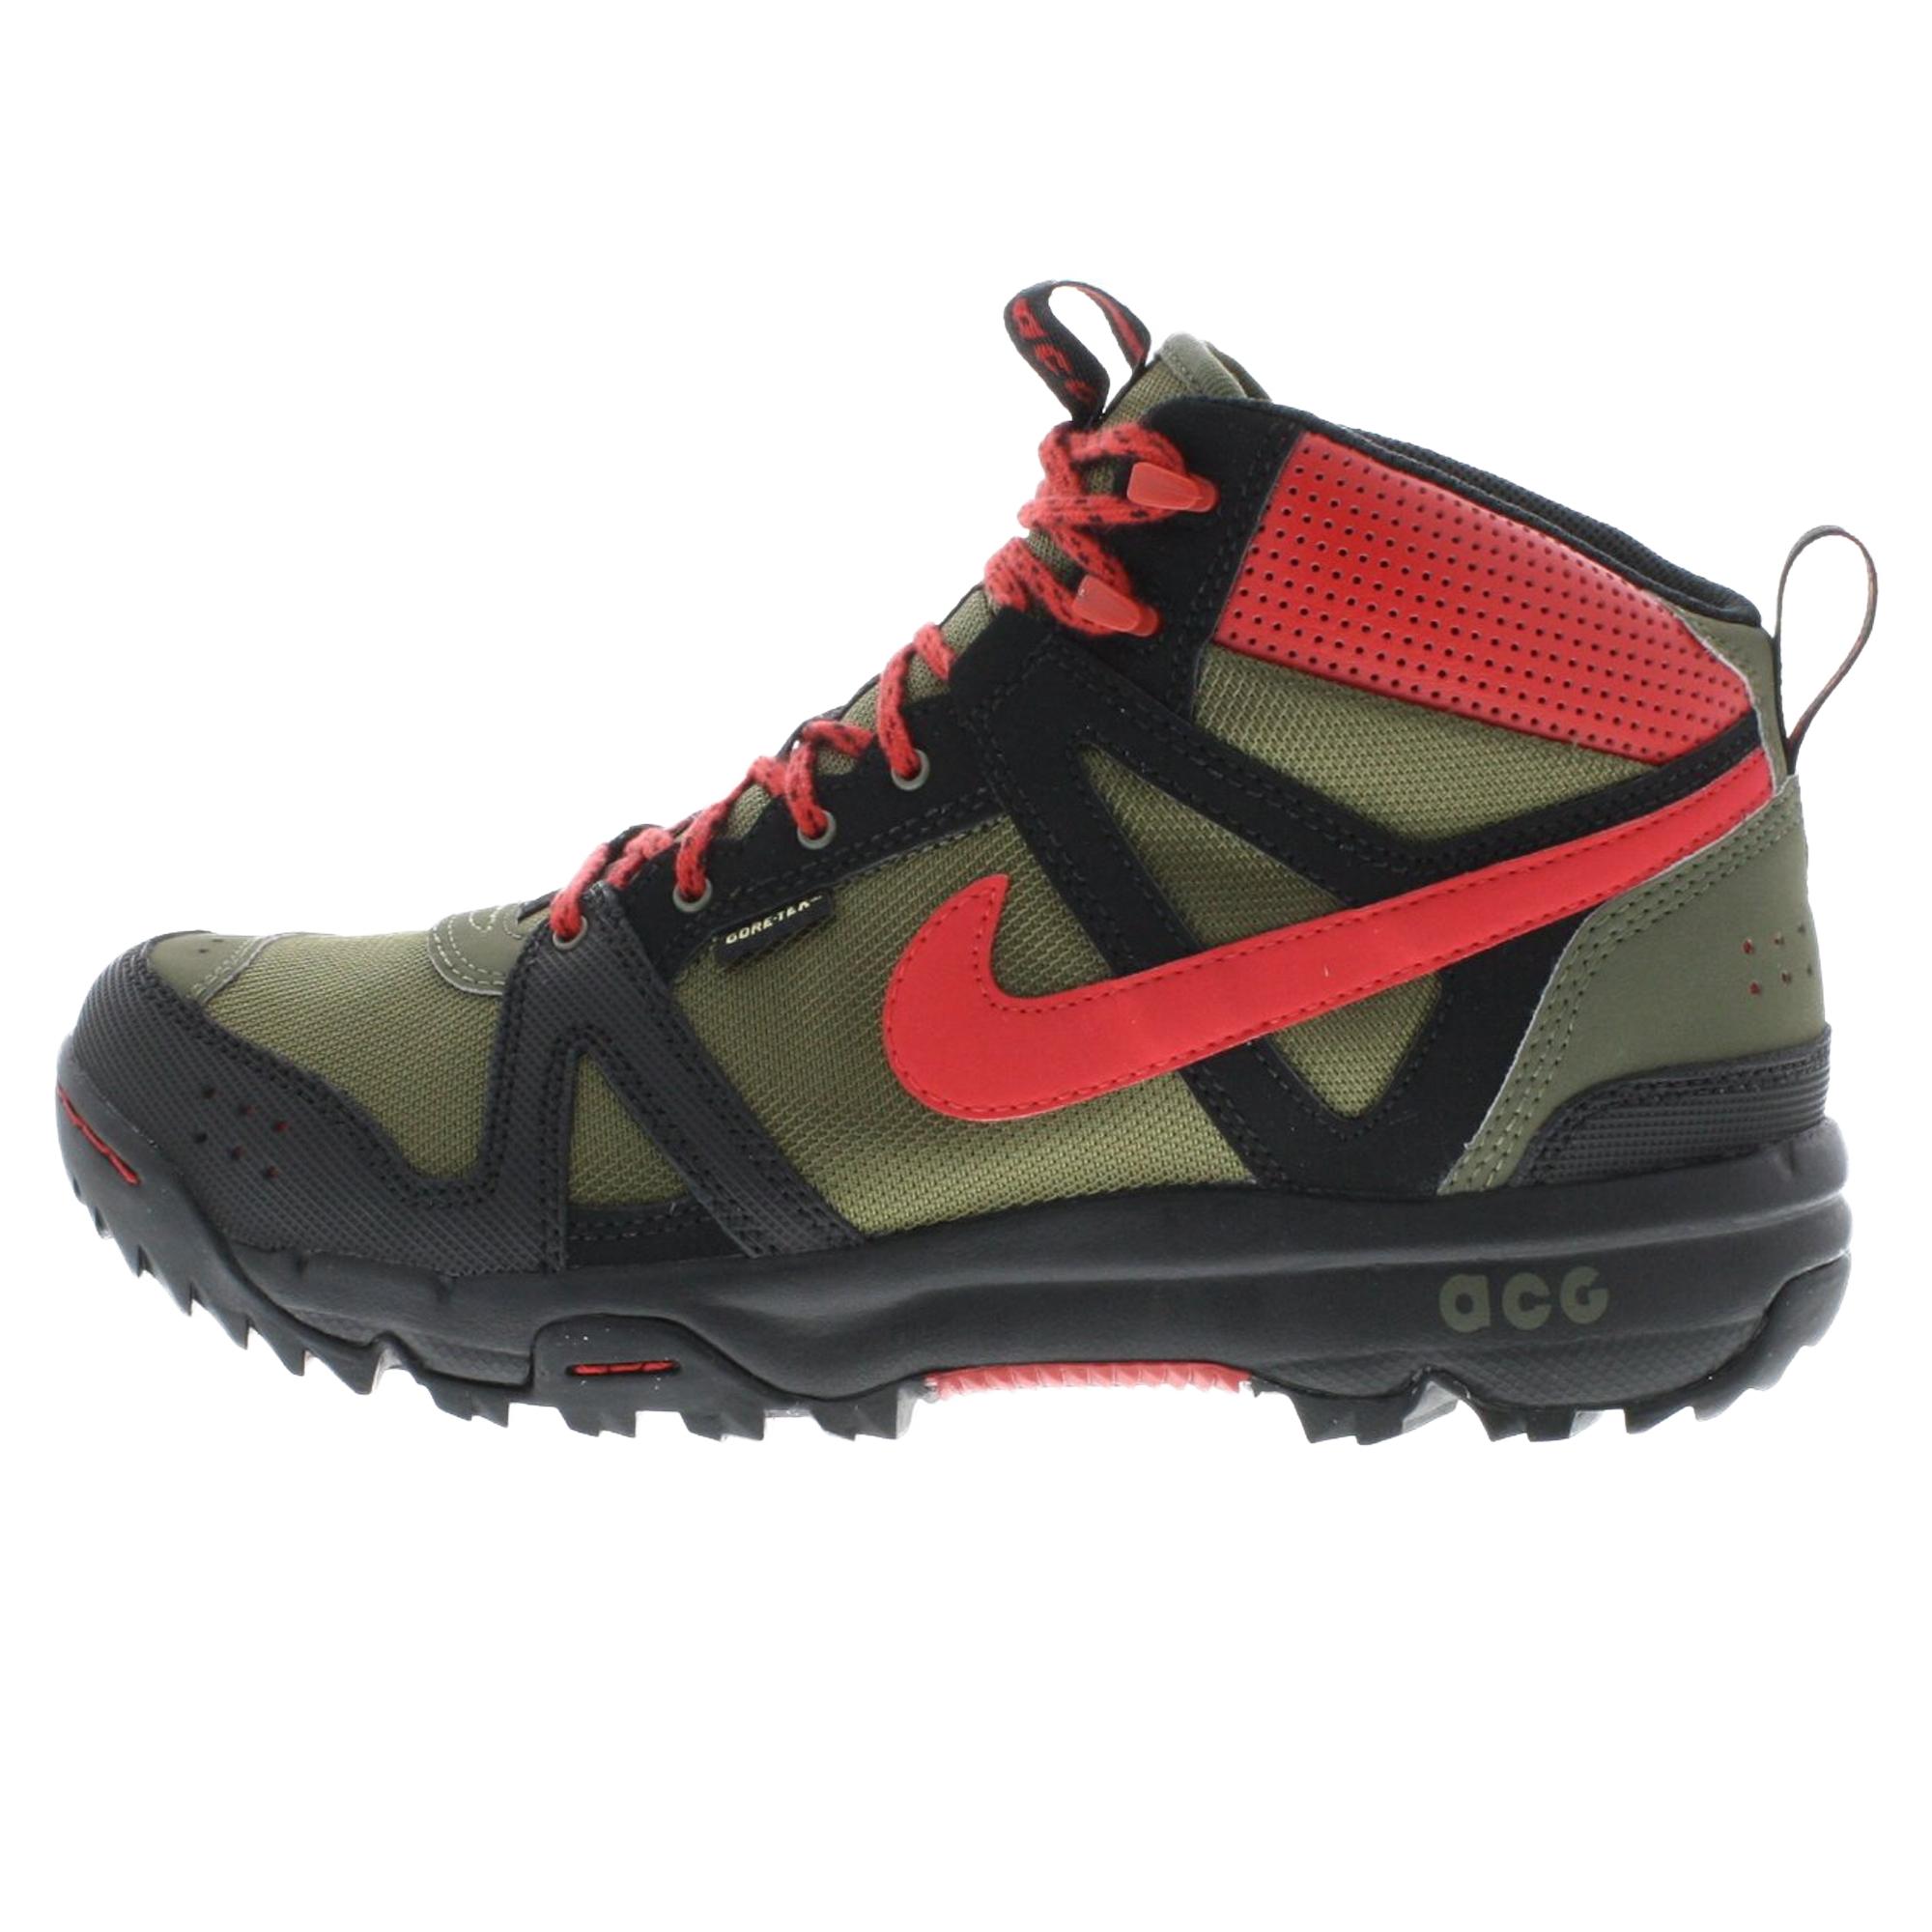 d514edd6074 ... Shoe Nike Rongbuk Mid Gtx Erkek Bot ...